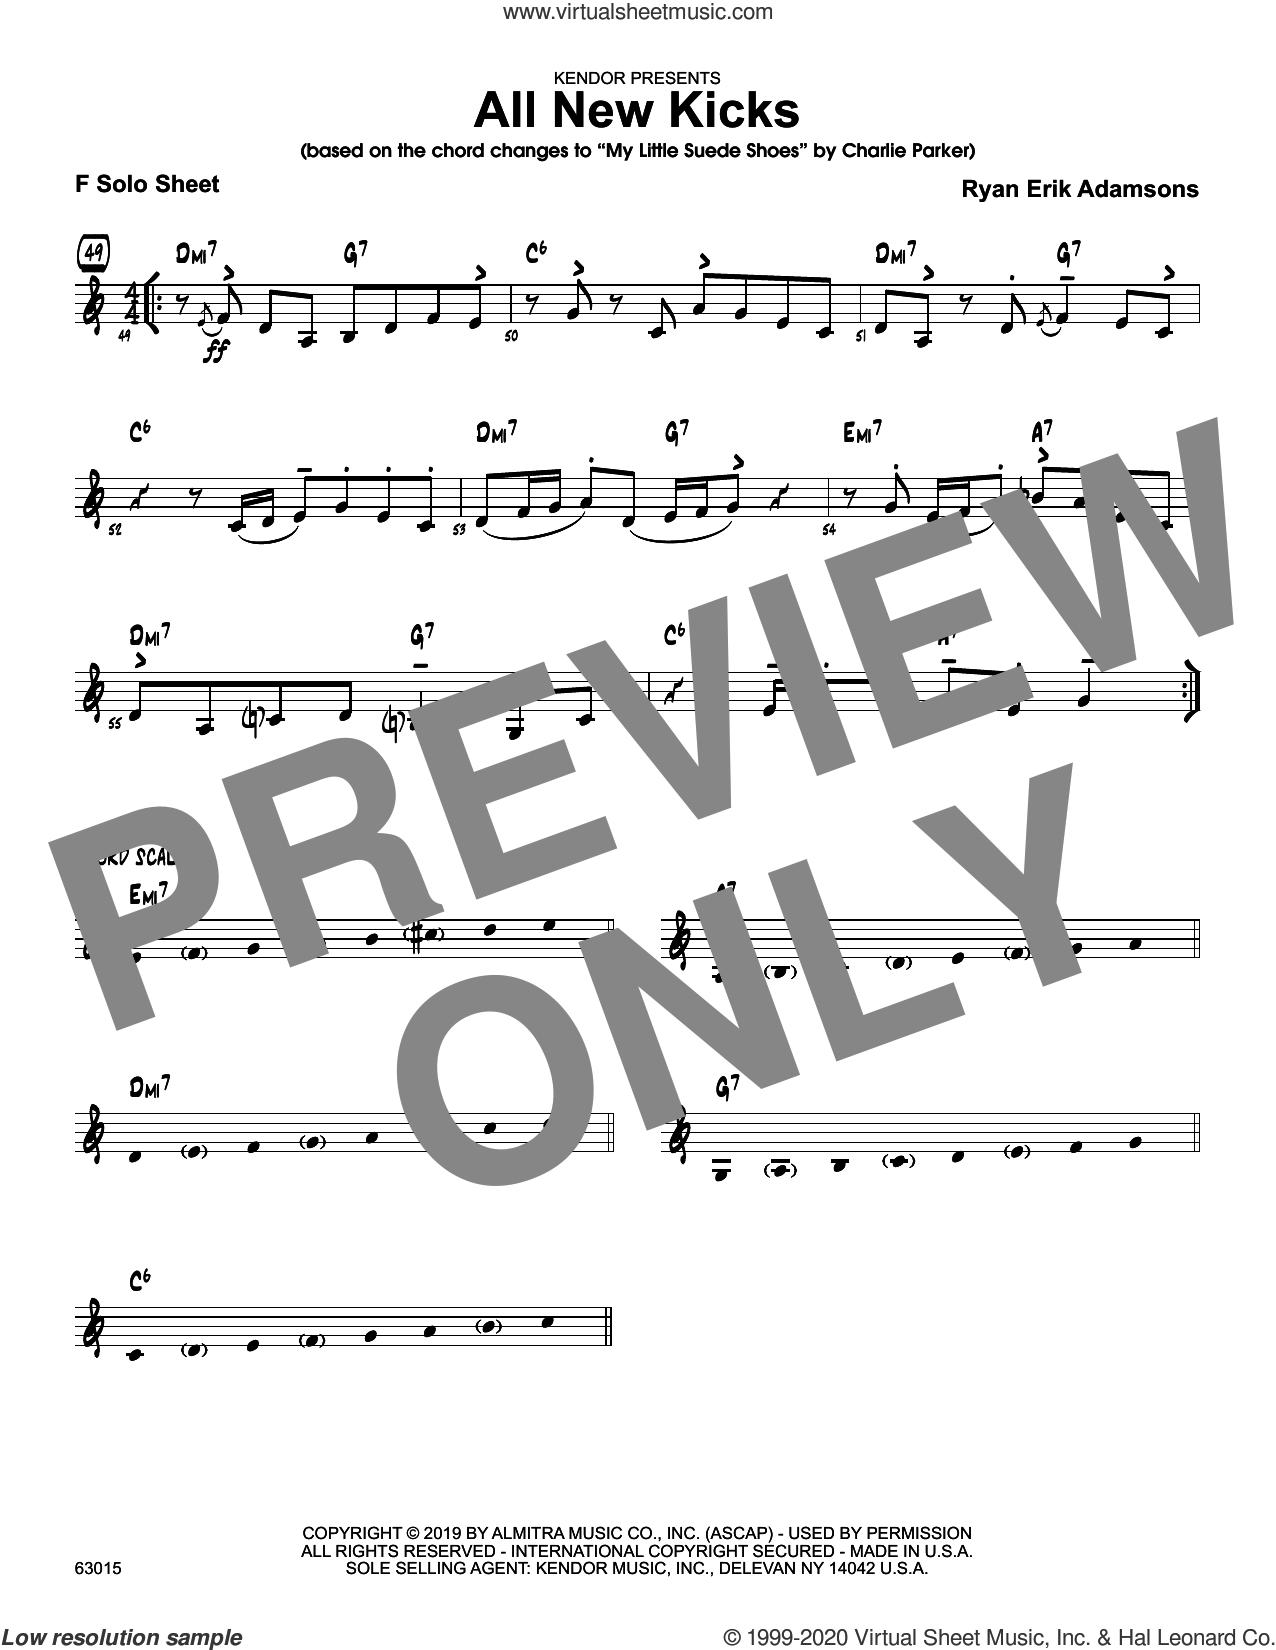 All New Kicks, solo sheet sheet music for jazz band (solo sheet - trumpet) by Ryan Erik Adamsons, intermediate skill level